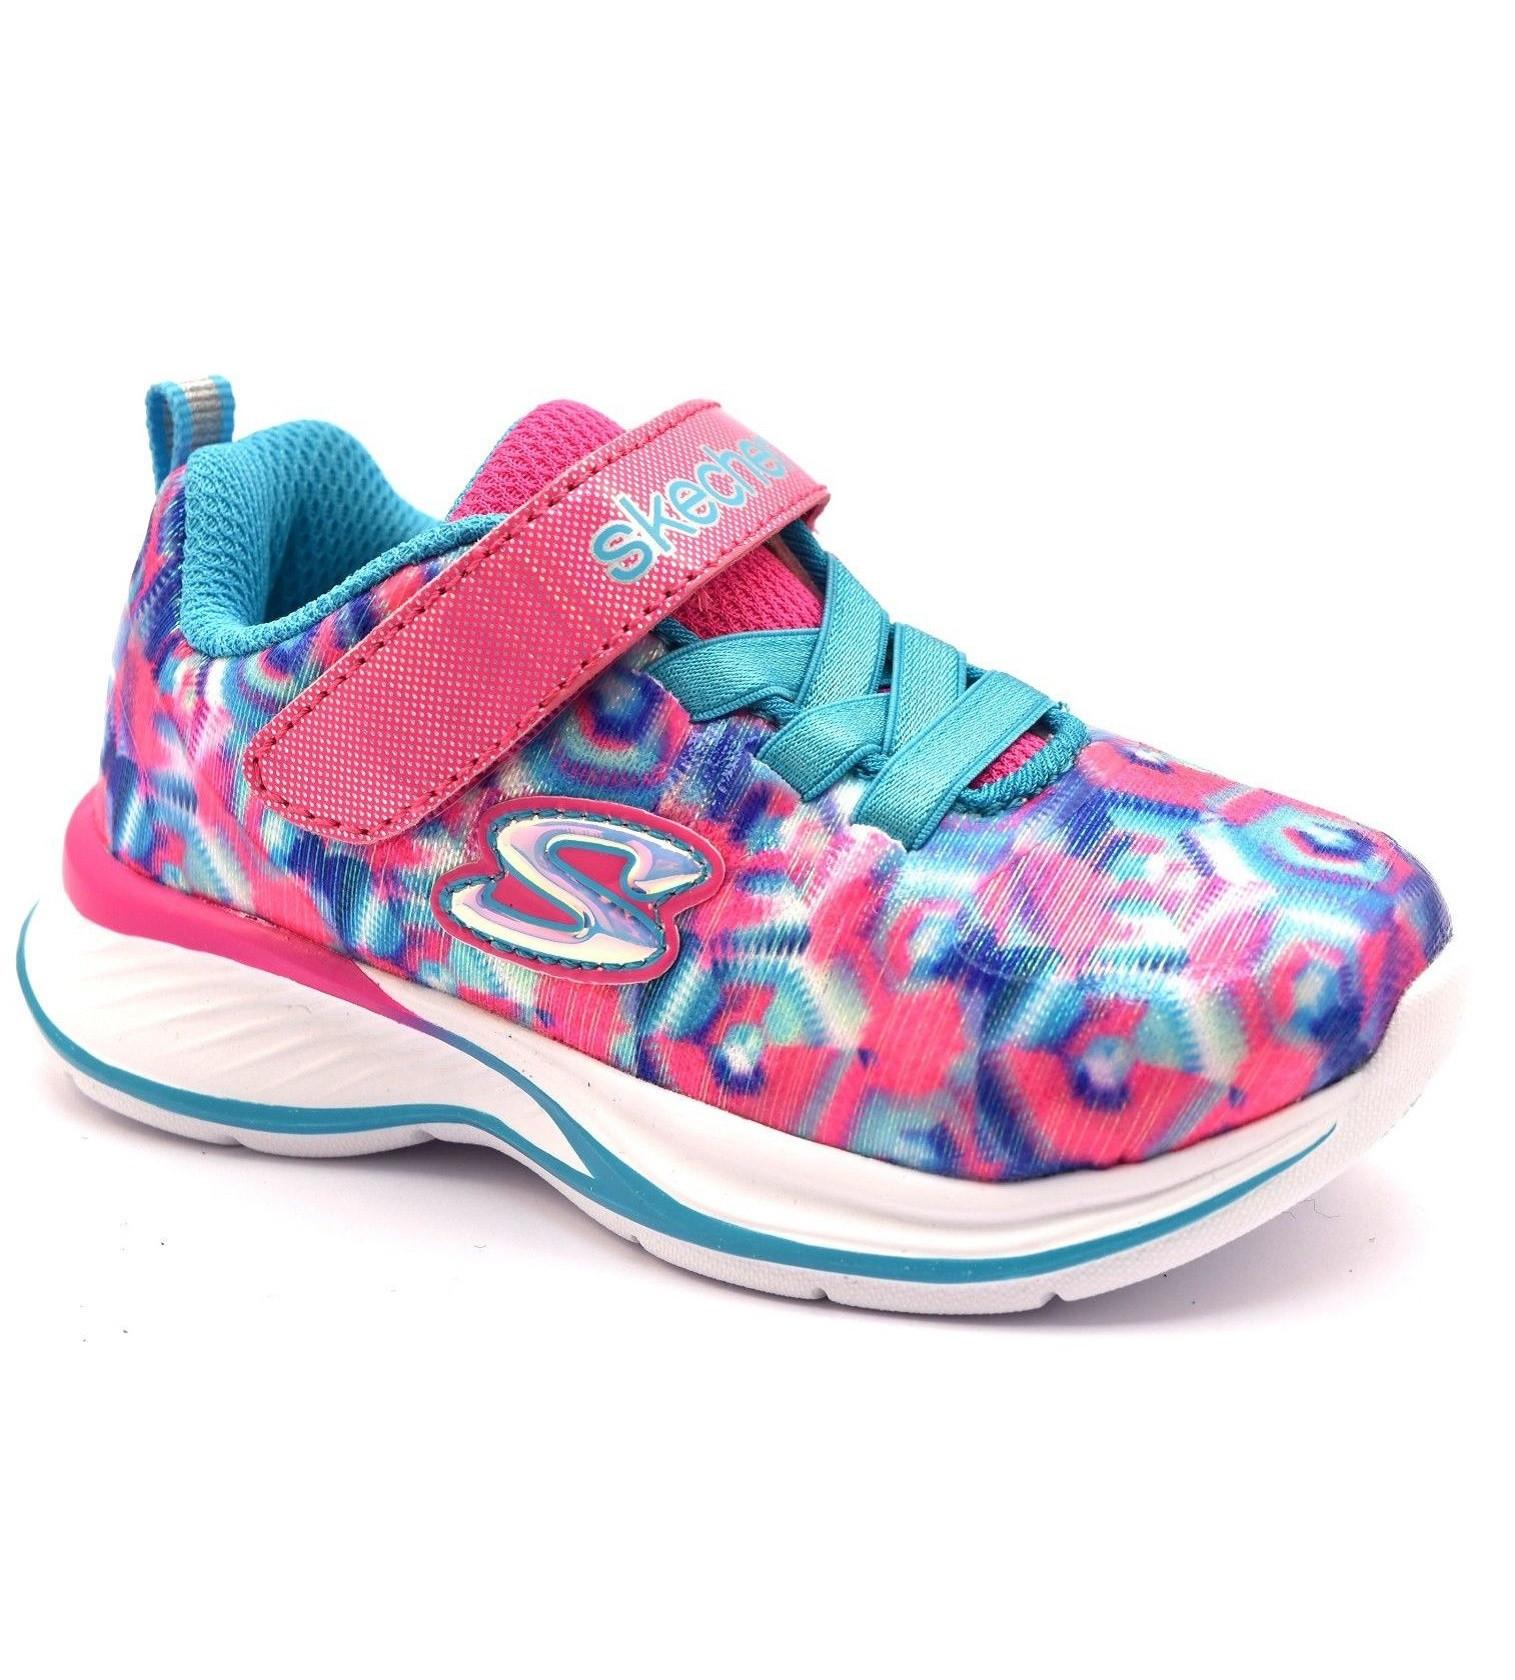 Купити Кросівки Skechers JUMPIN JAMS NEON PINK/MULTI - фото 1